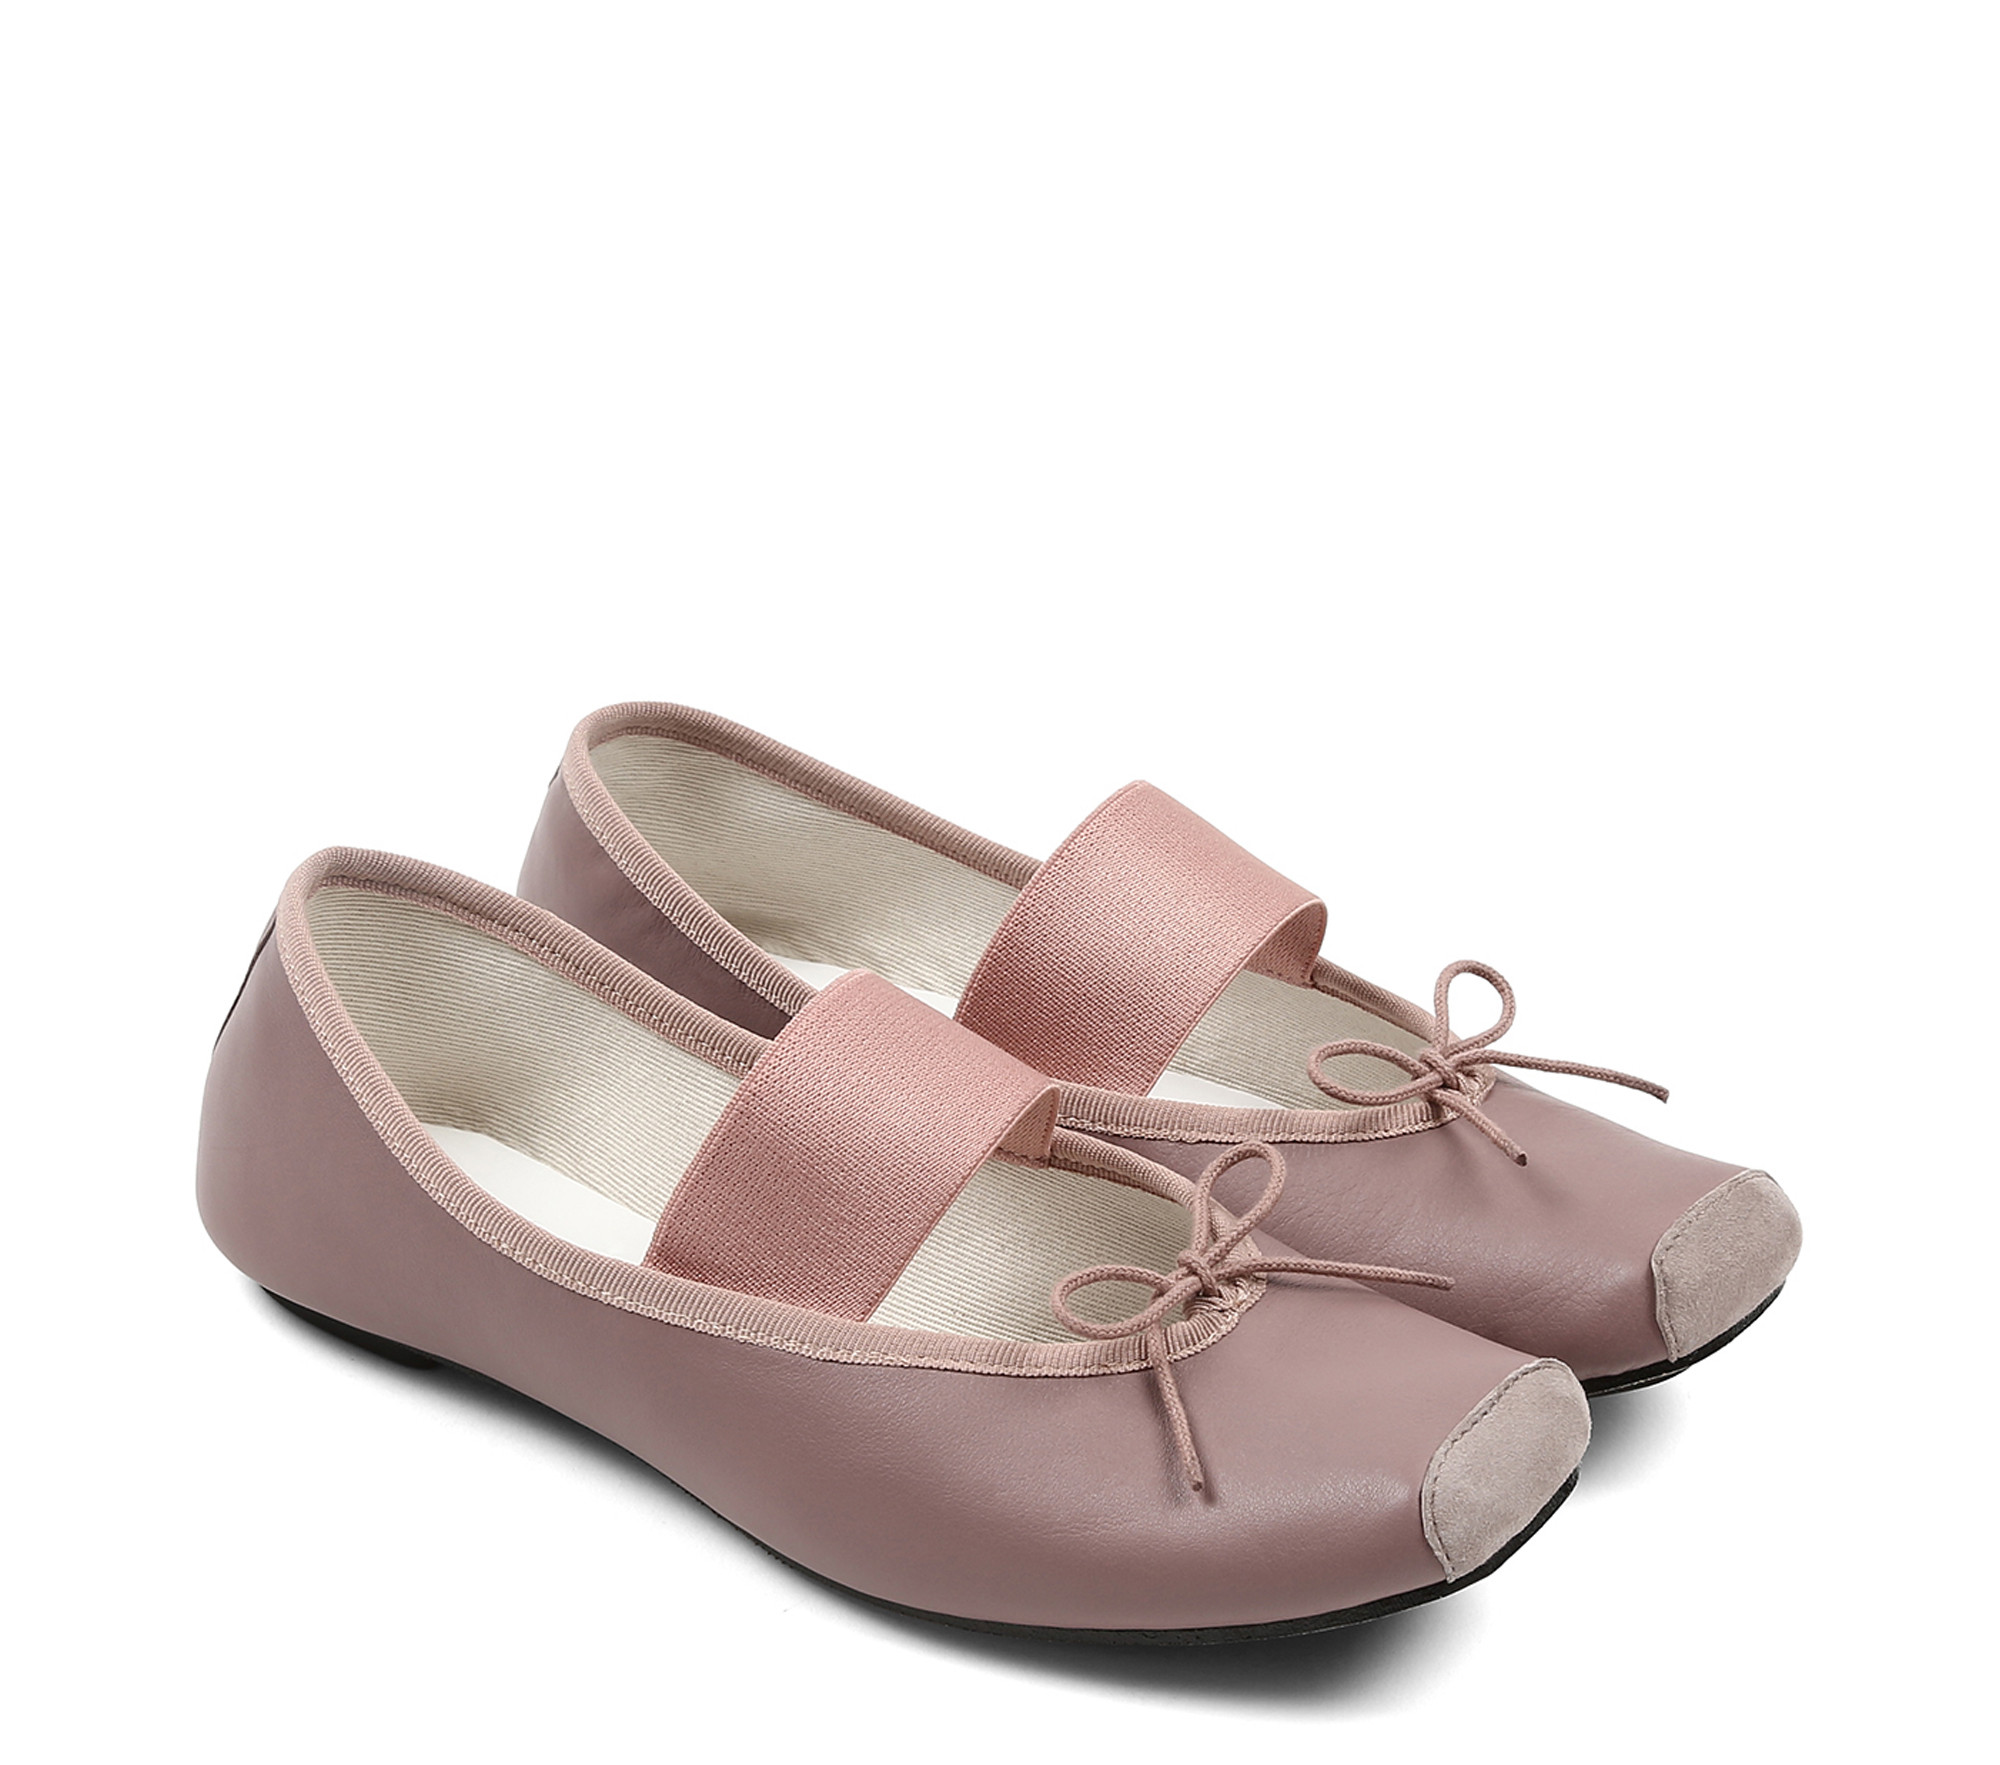 Catherine ballerinas